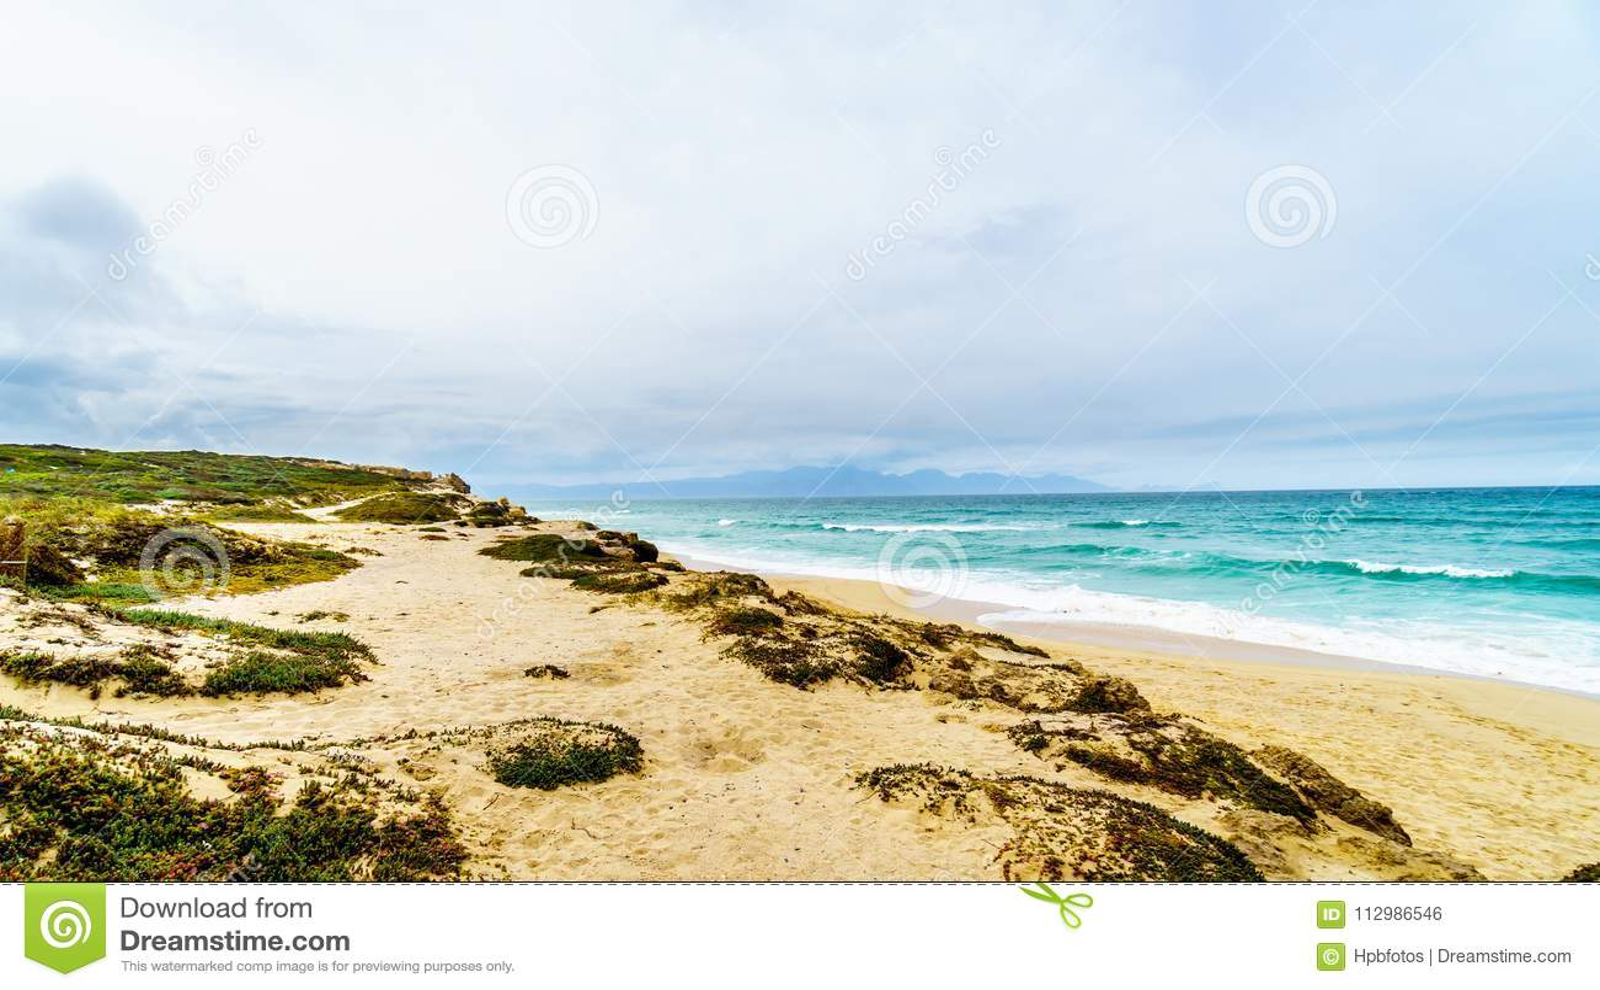 The beautiful beaches on False Bay along Baden Powell Drive between Macassar and Muizenberg near Cape Town